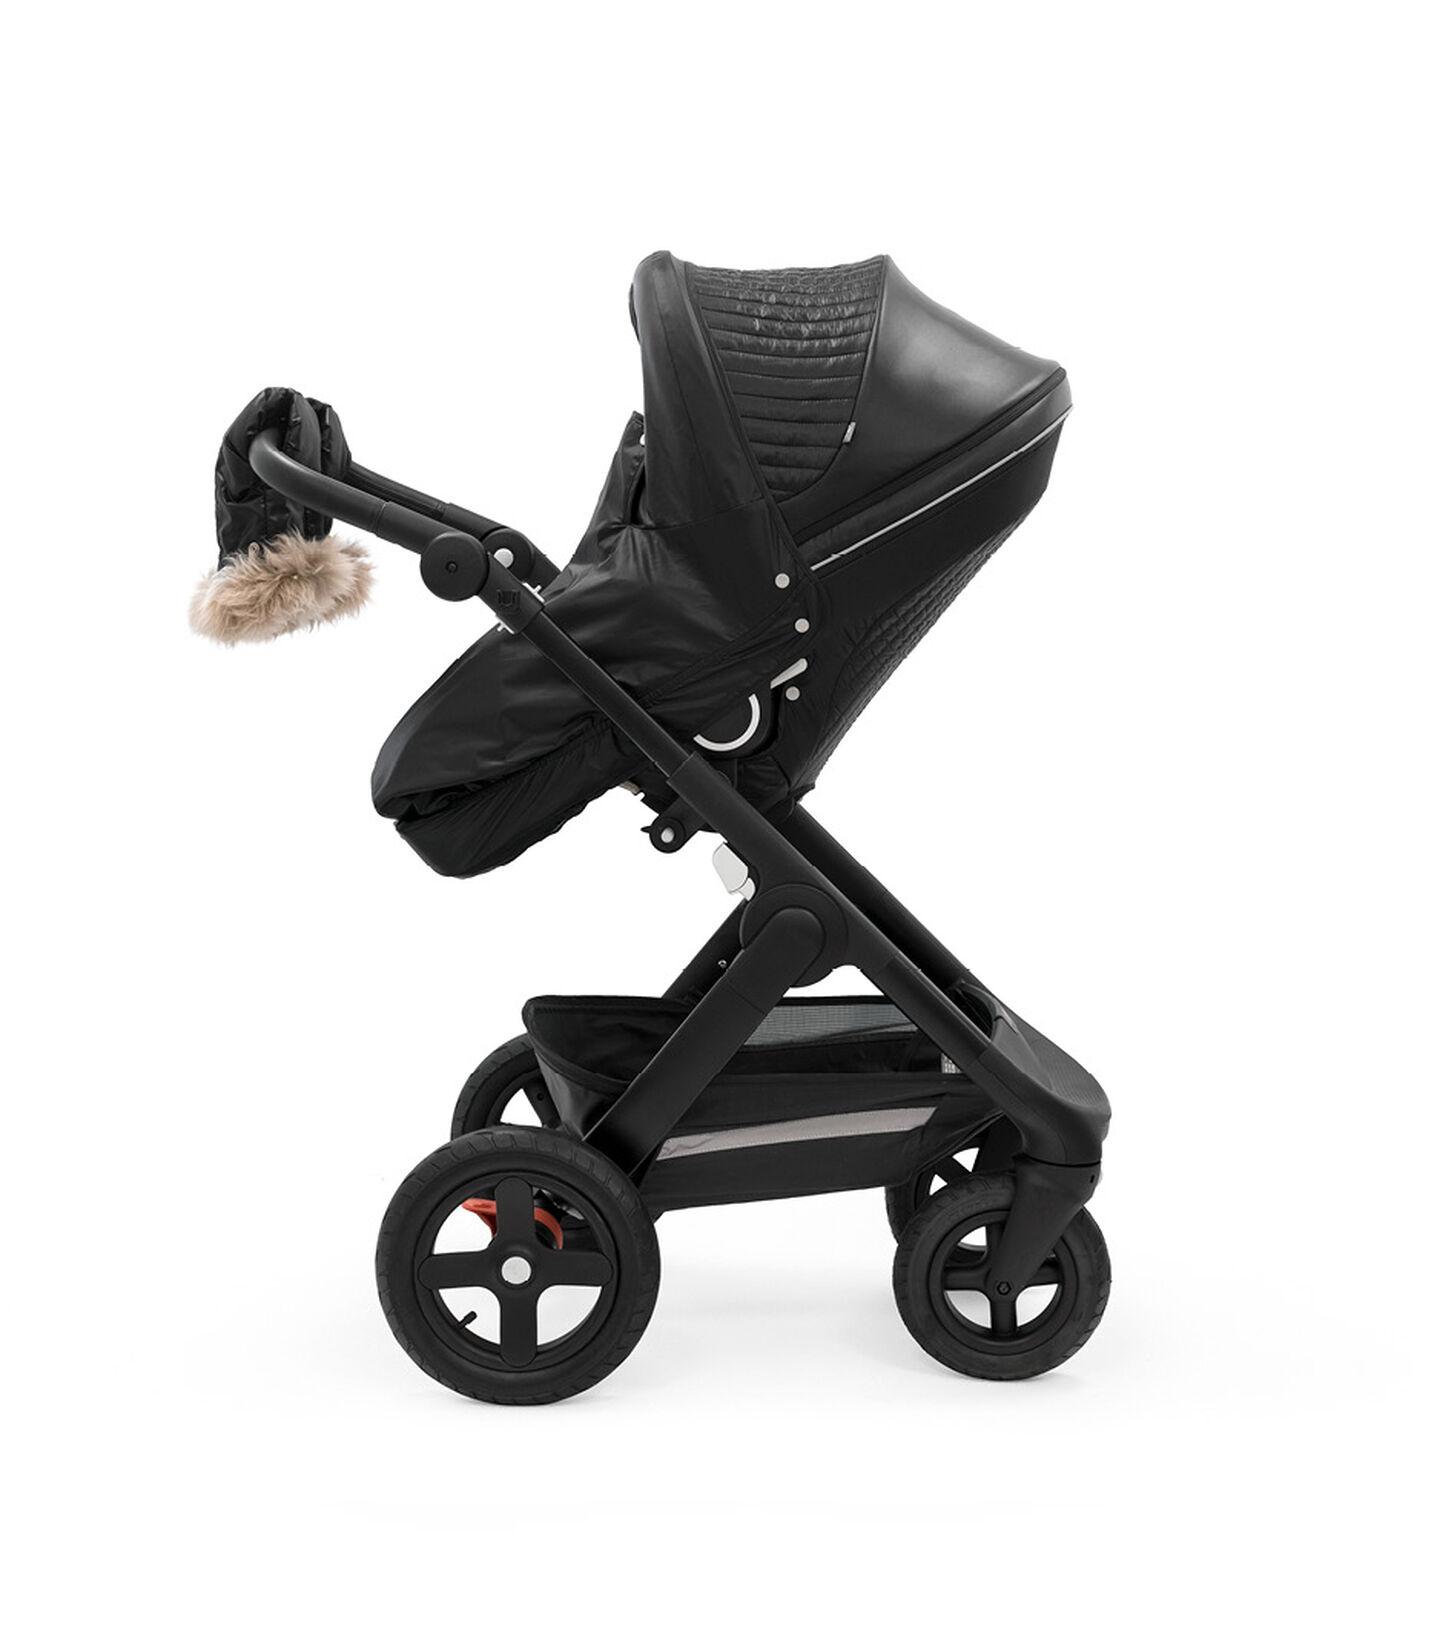 Stokke® Stroller Winter Kit Onyx Black, Onyx Black, mainview view 2